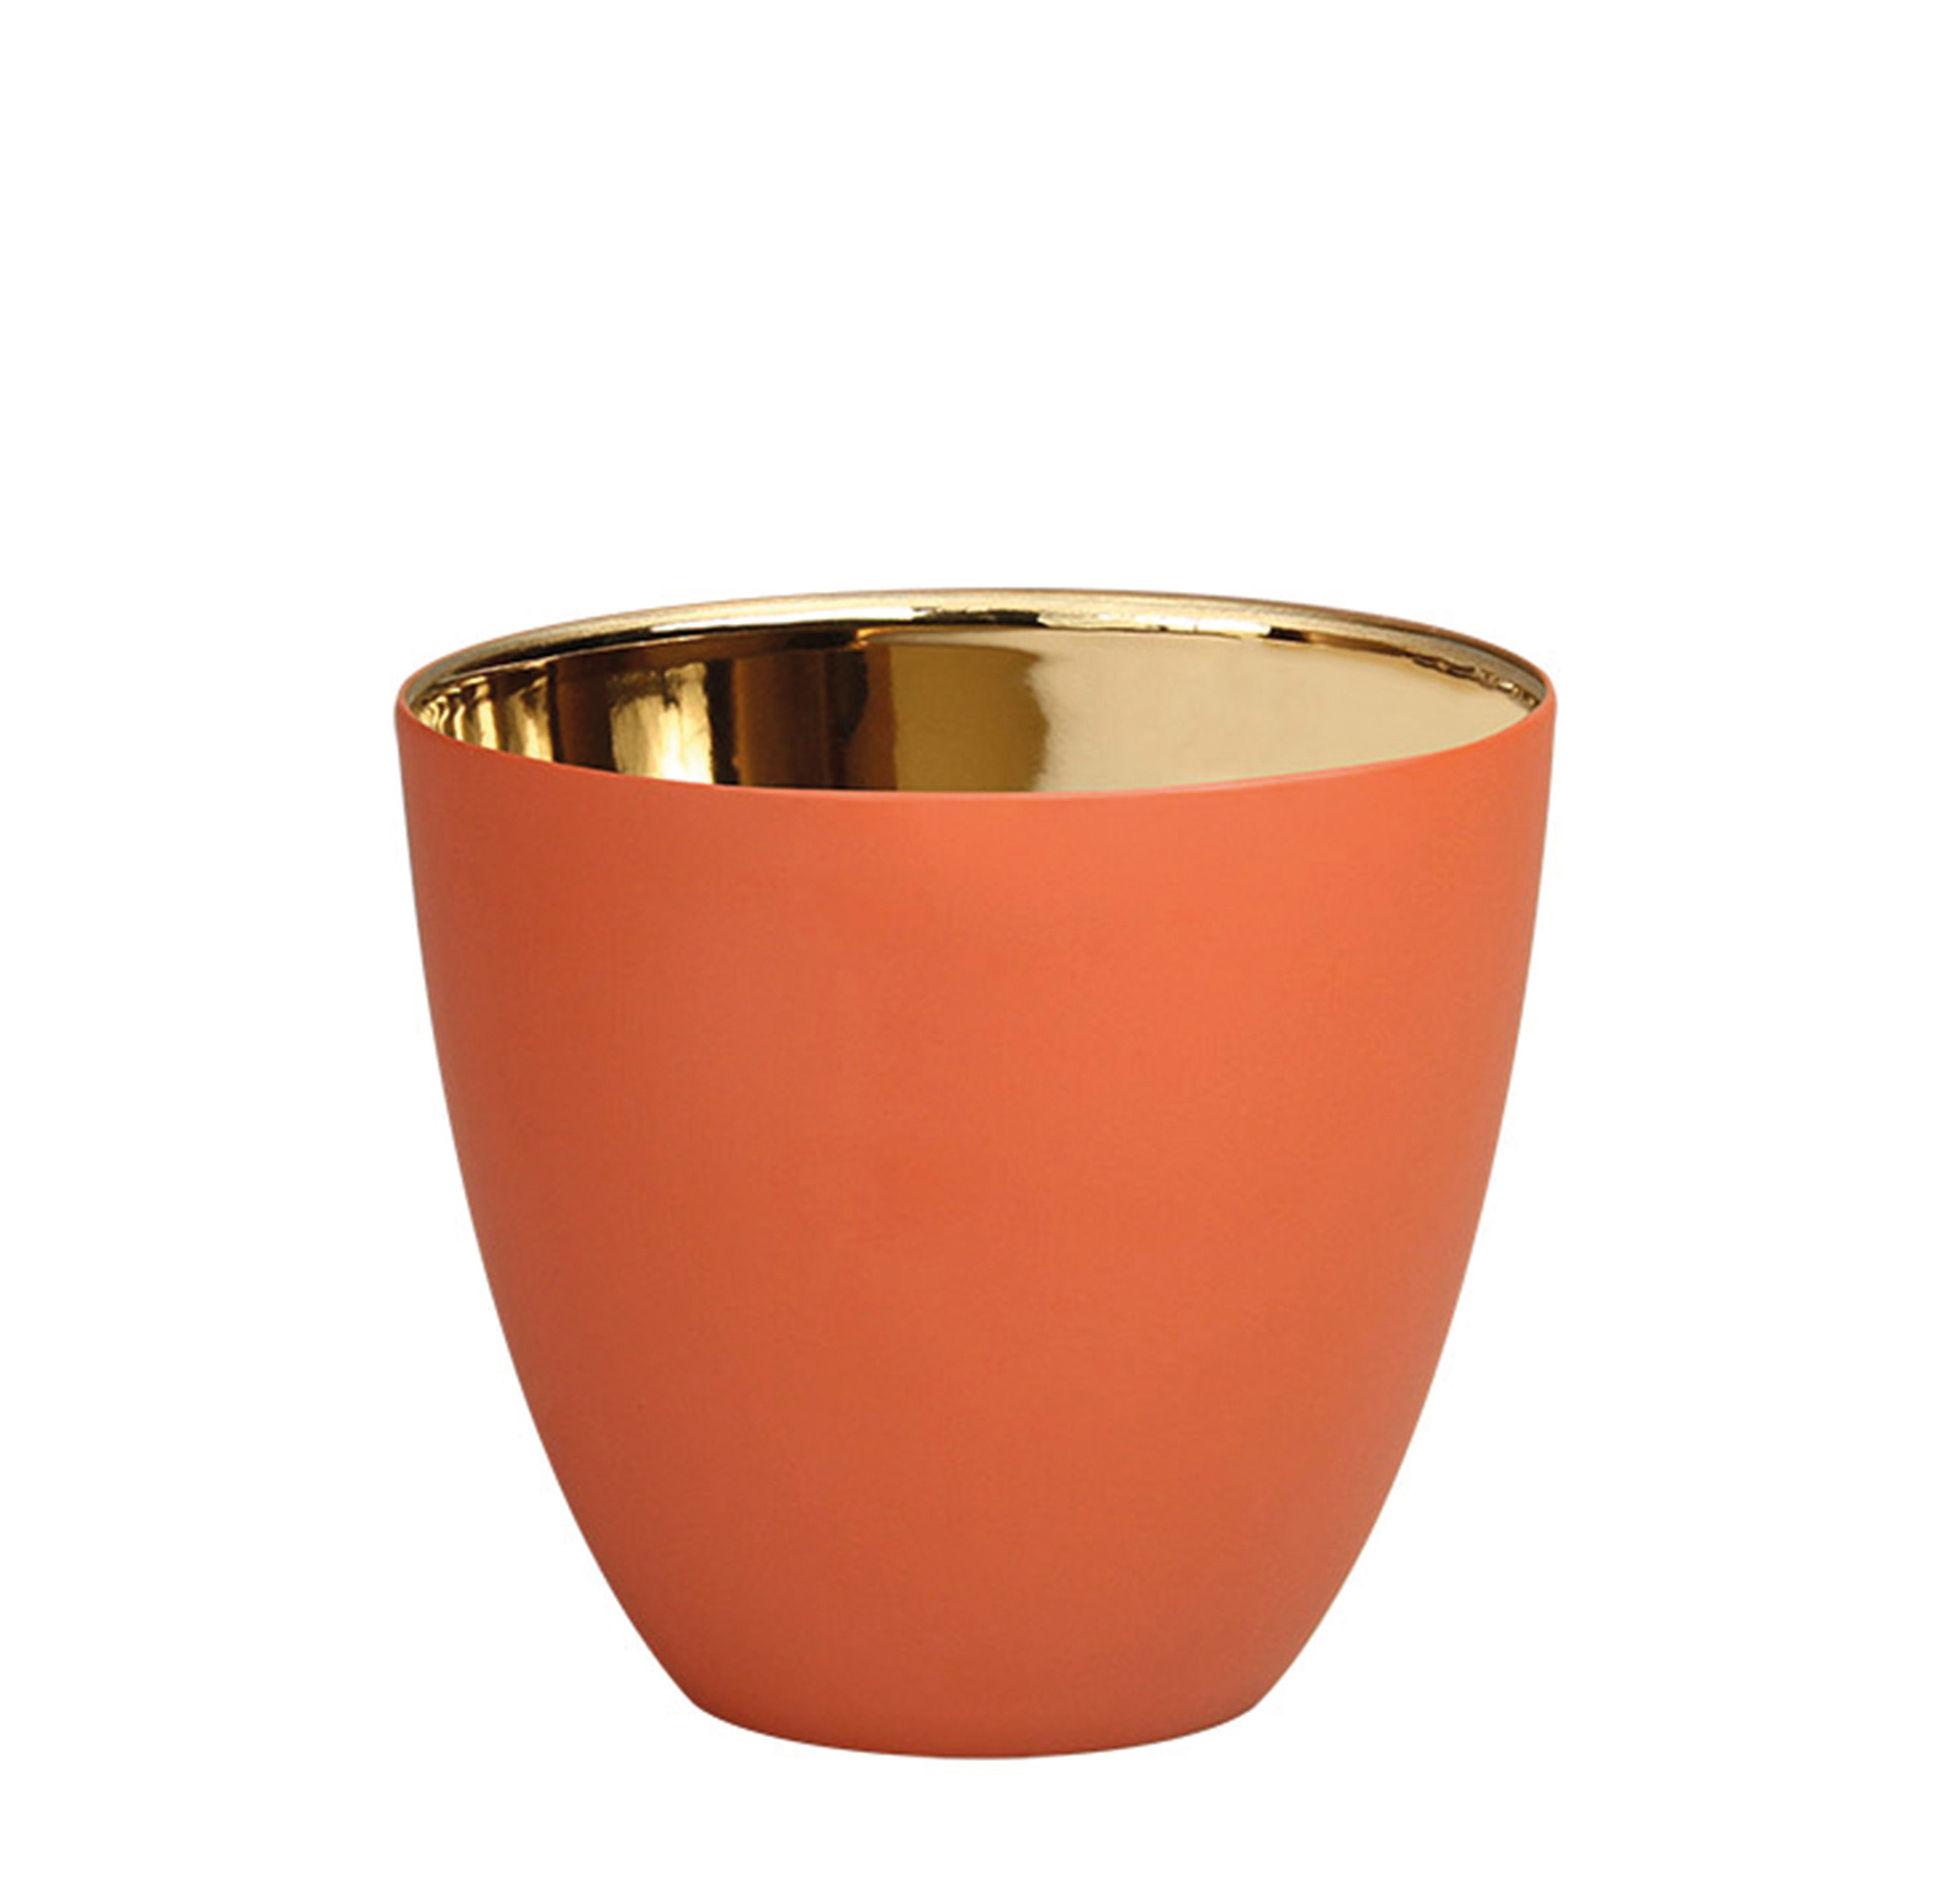 Interni - Candele, Portacandele, Lampade - Portacandela Summer Small - / H 6,5 cm - Porcellana di & klevering - Terracotta / Or - Porcellana